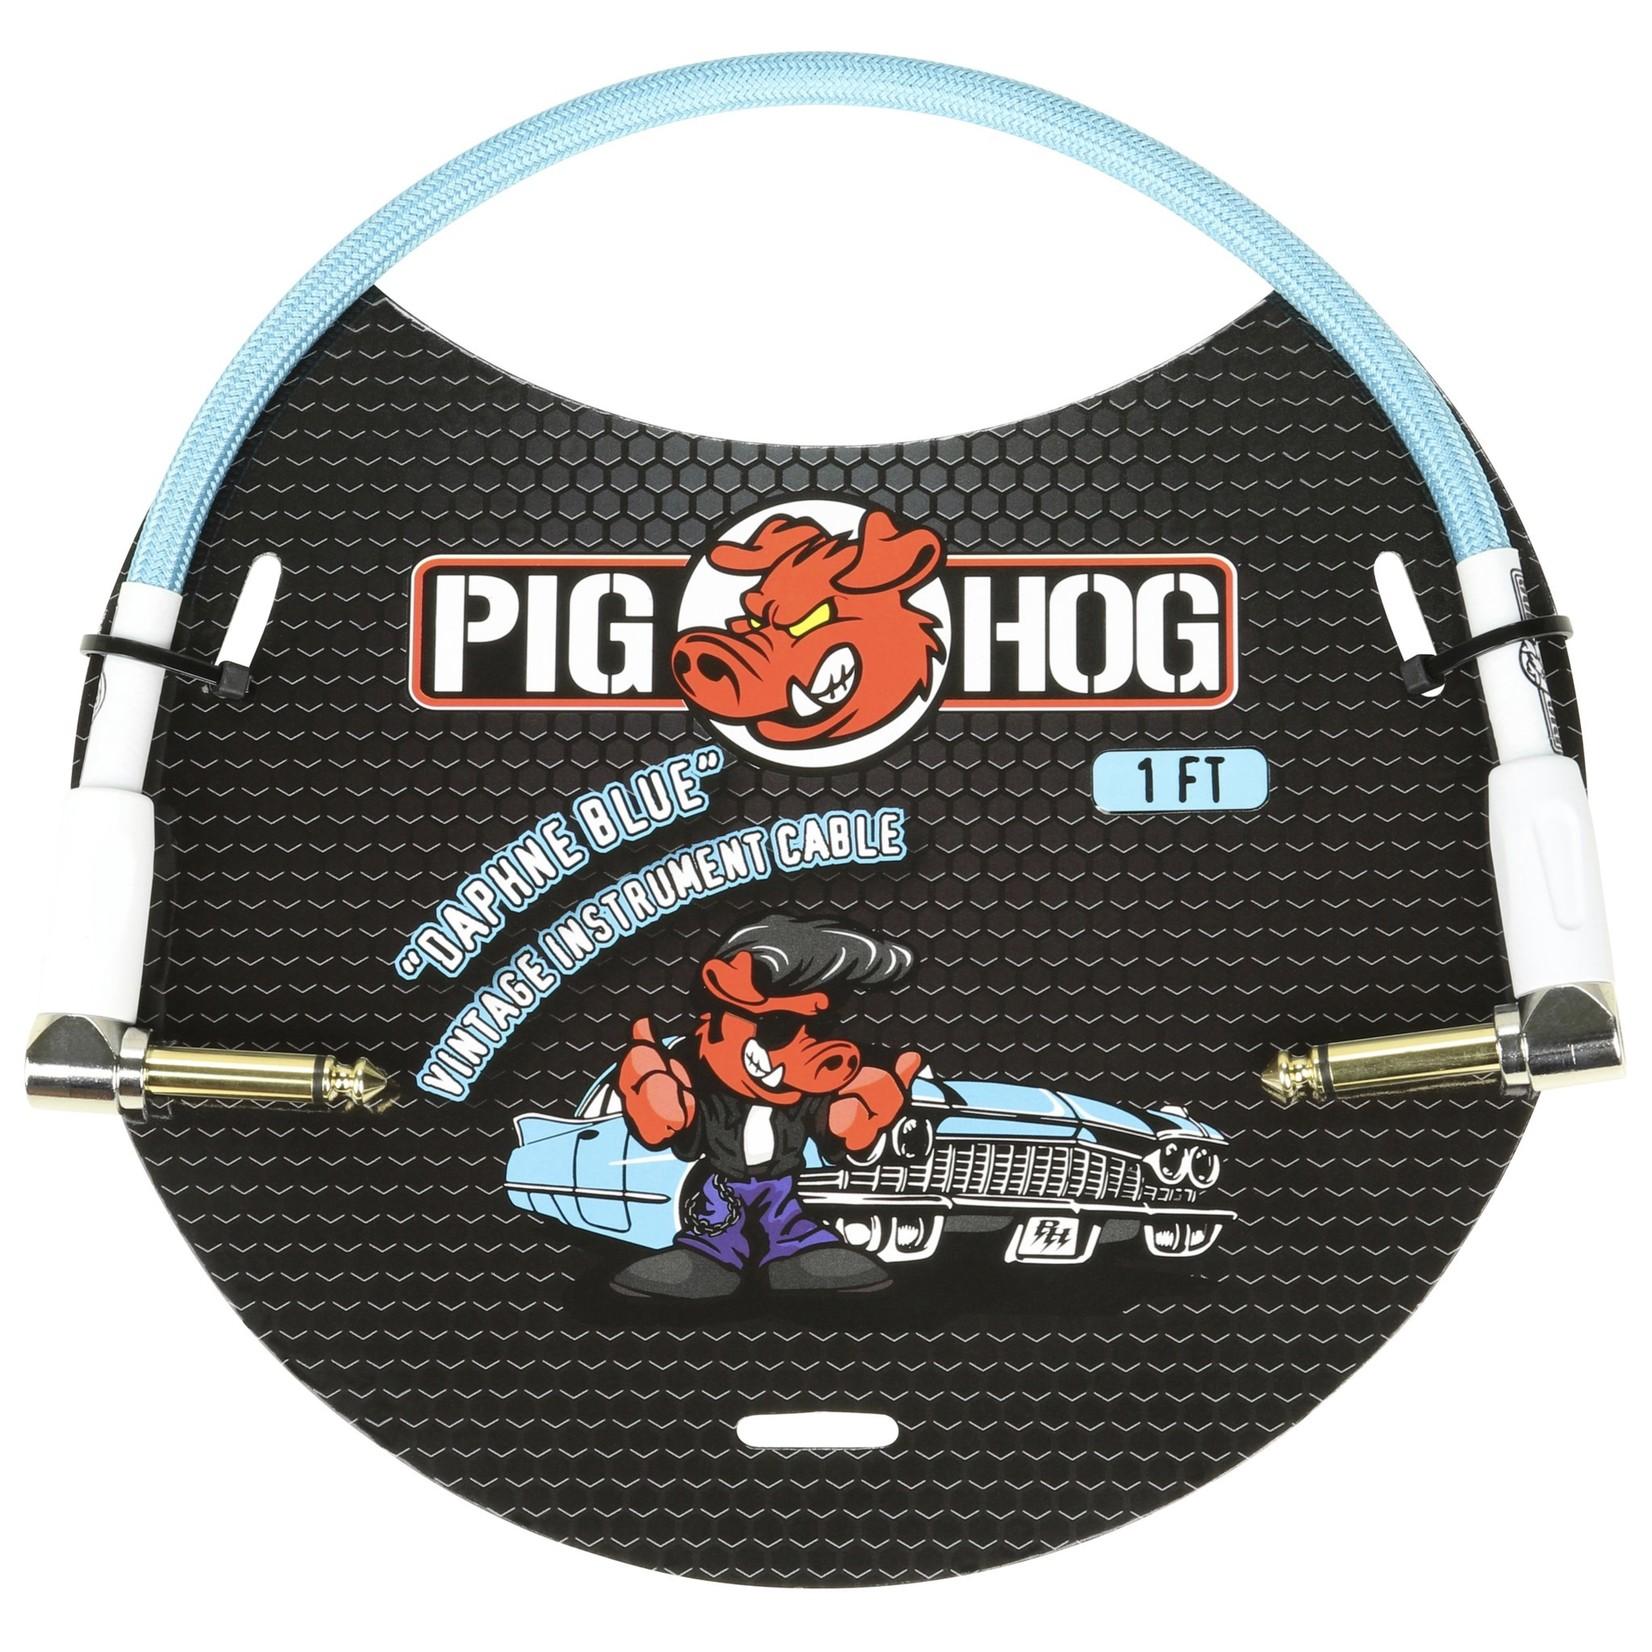 Pig Hog Pig Hog Vintage Woven Patch Cable, 1-Foot, 7mm, Right-Angle Connectors, Daphne Blue (PCH1DBR)